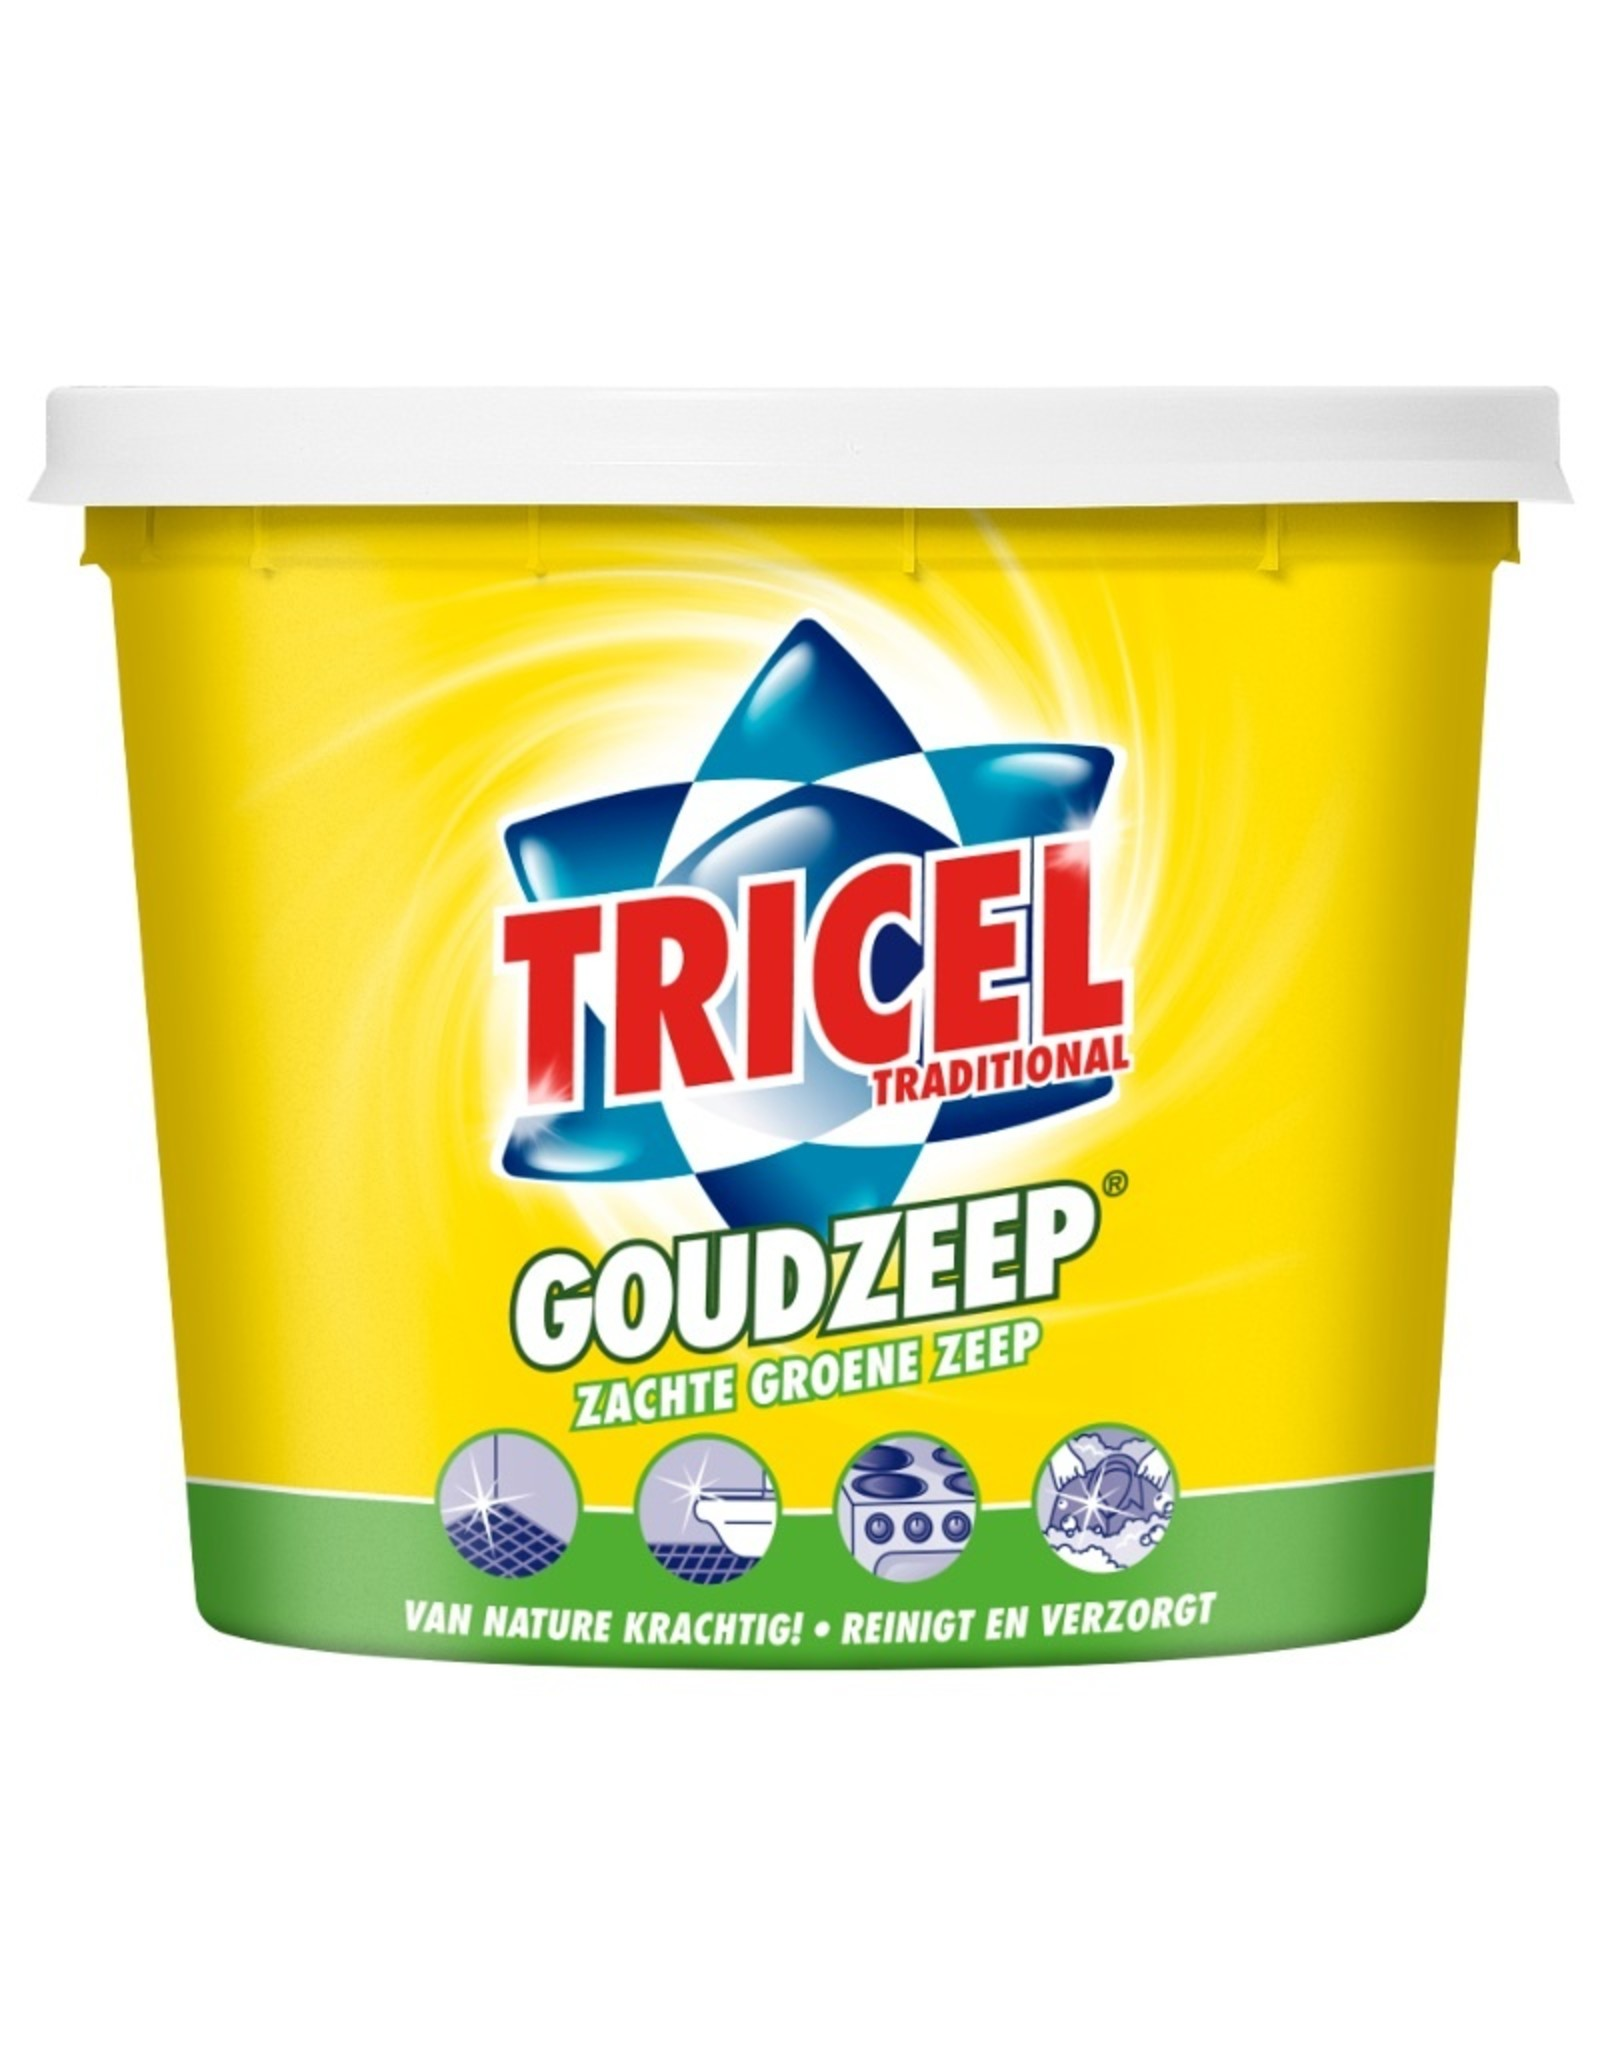 Tricel zachte goudzeep (groene zeep) 5 kg